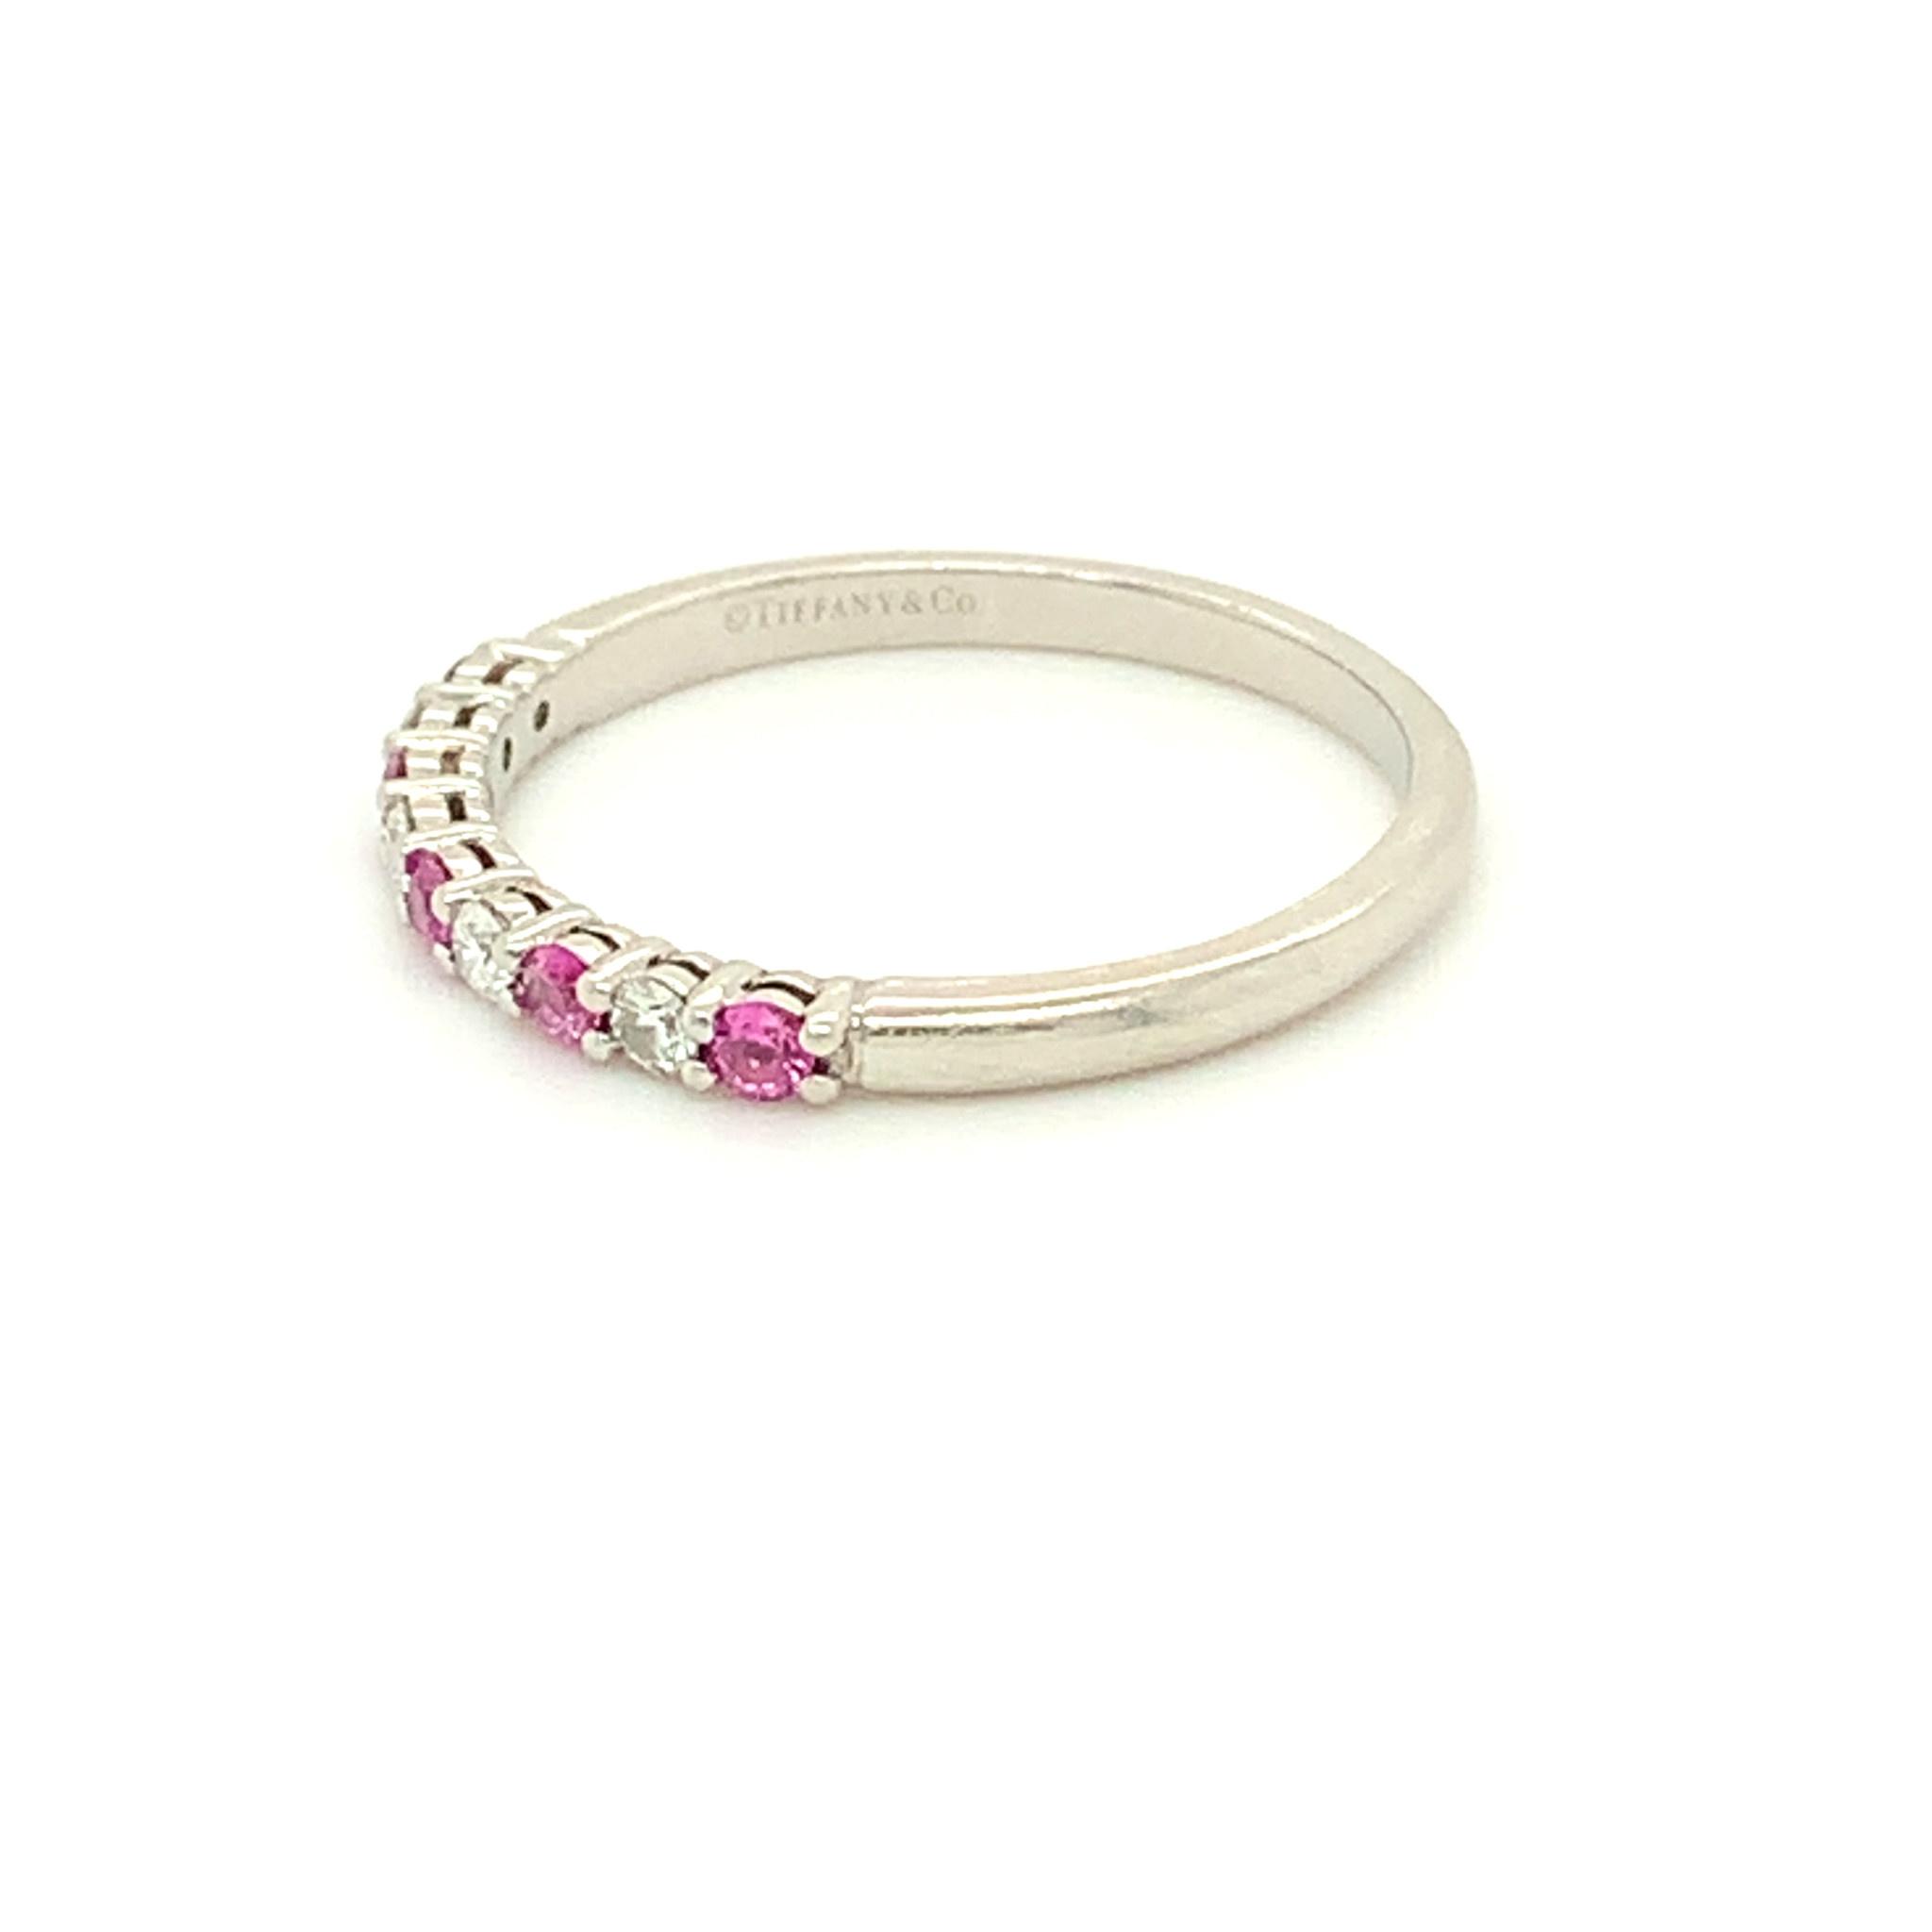 Freedman Tiffany & Co Embrace Platinum Diamond & Pink Sapphire Estate Band